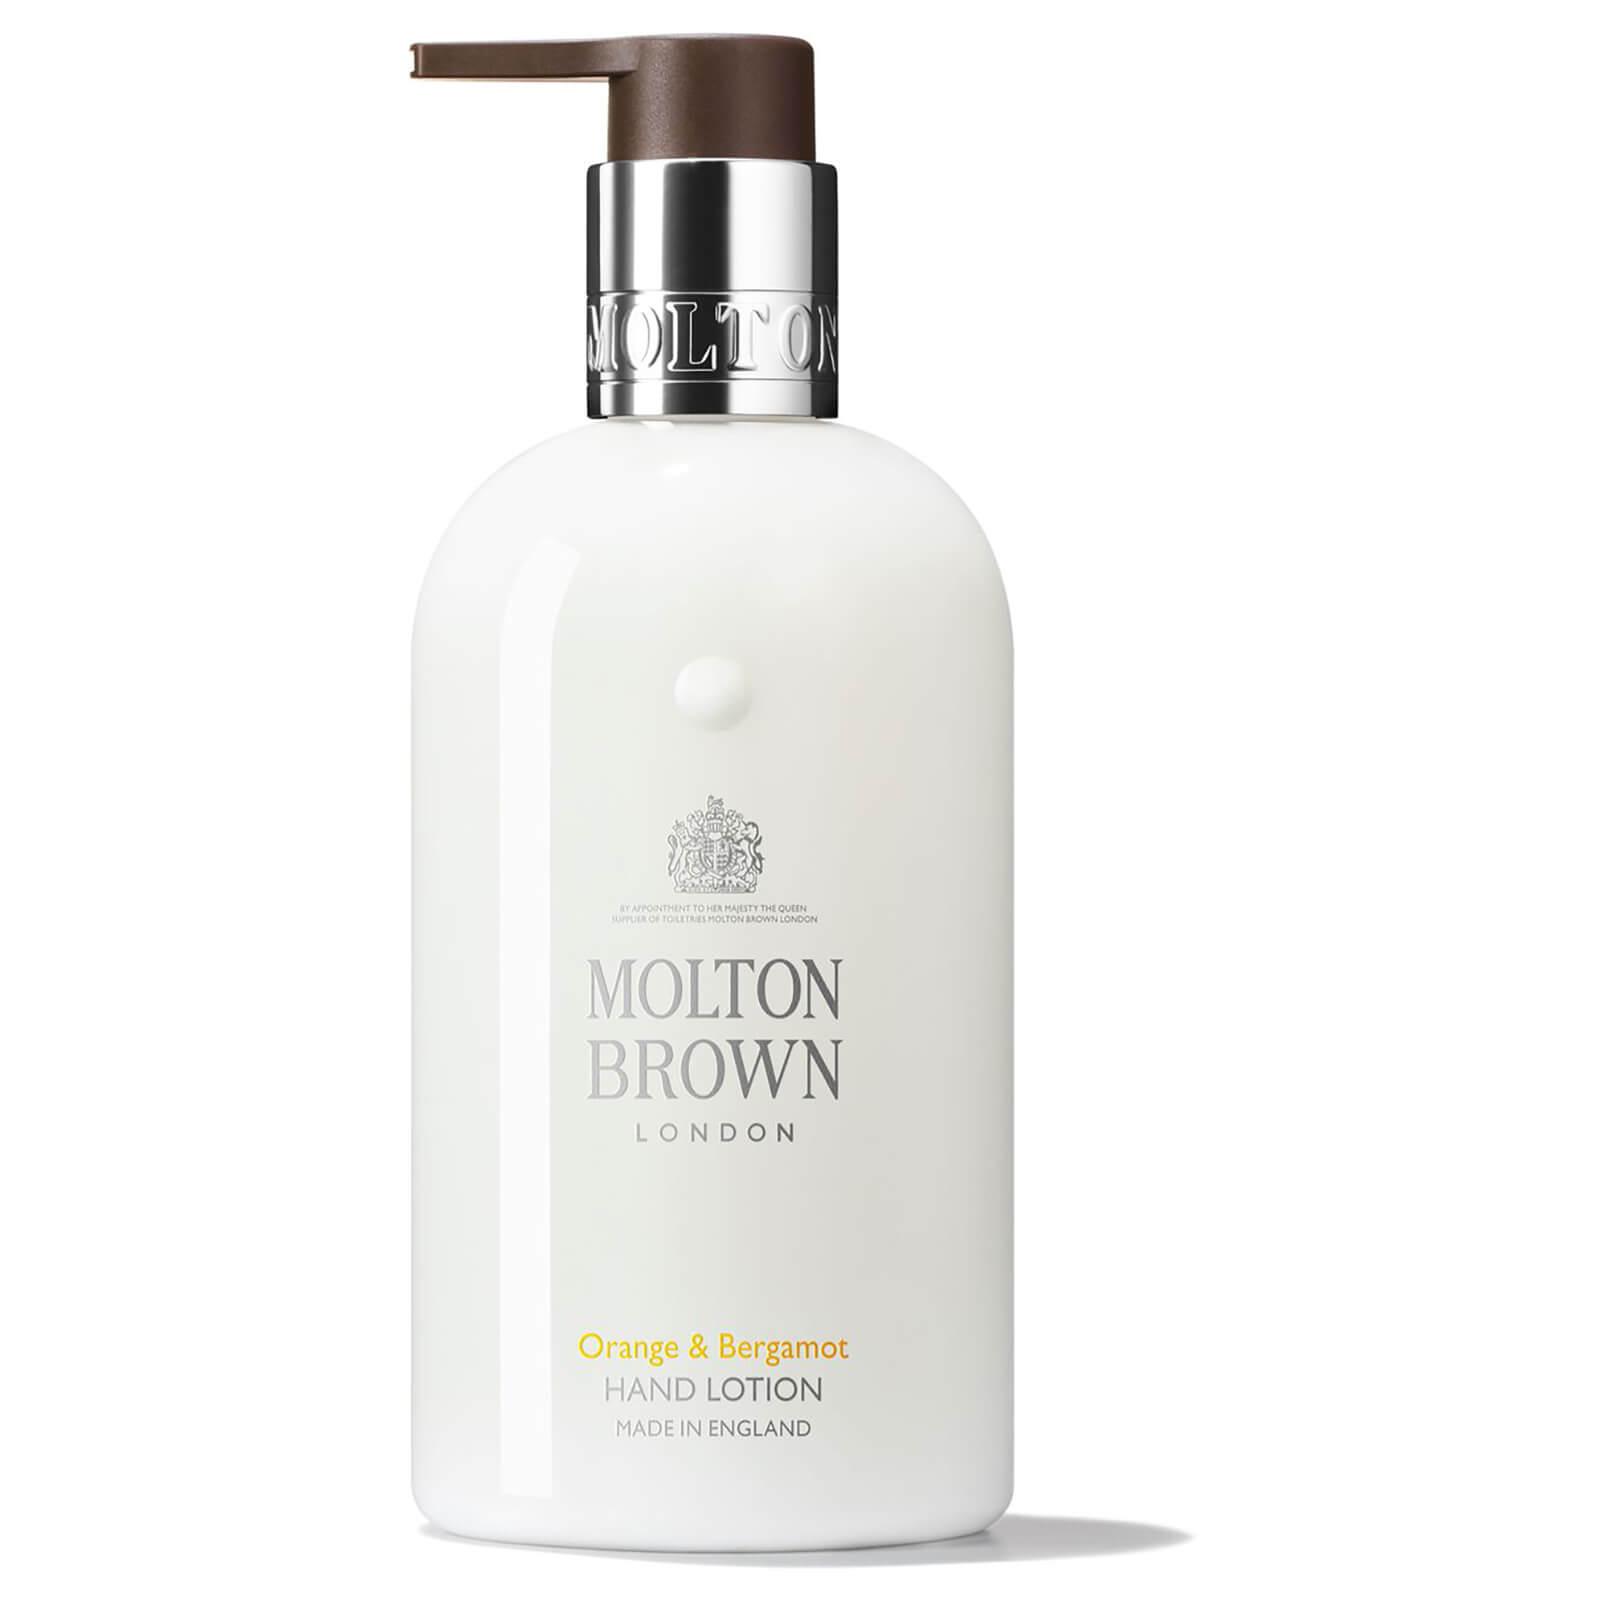 Molton Brown Orange & Bergamot Hand Lotion評價的圖片搜尋結果